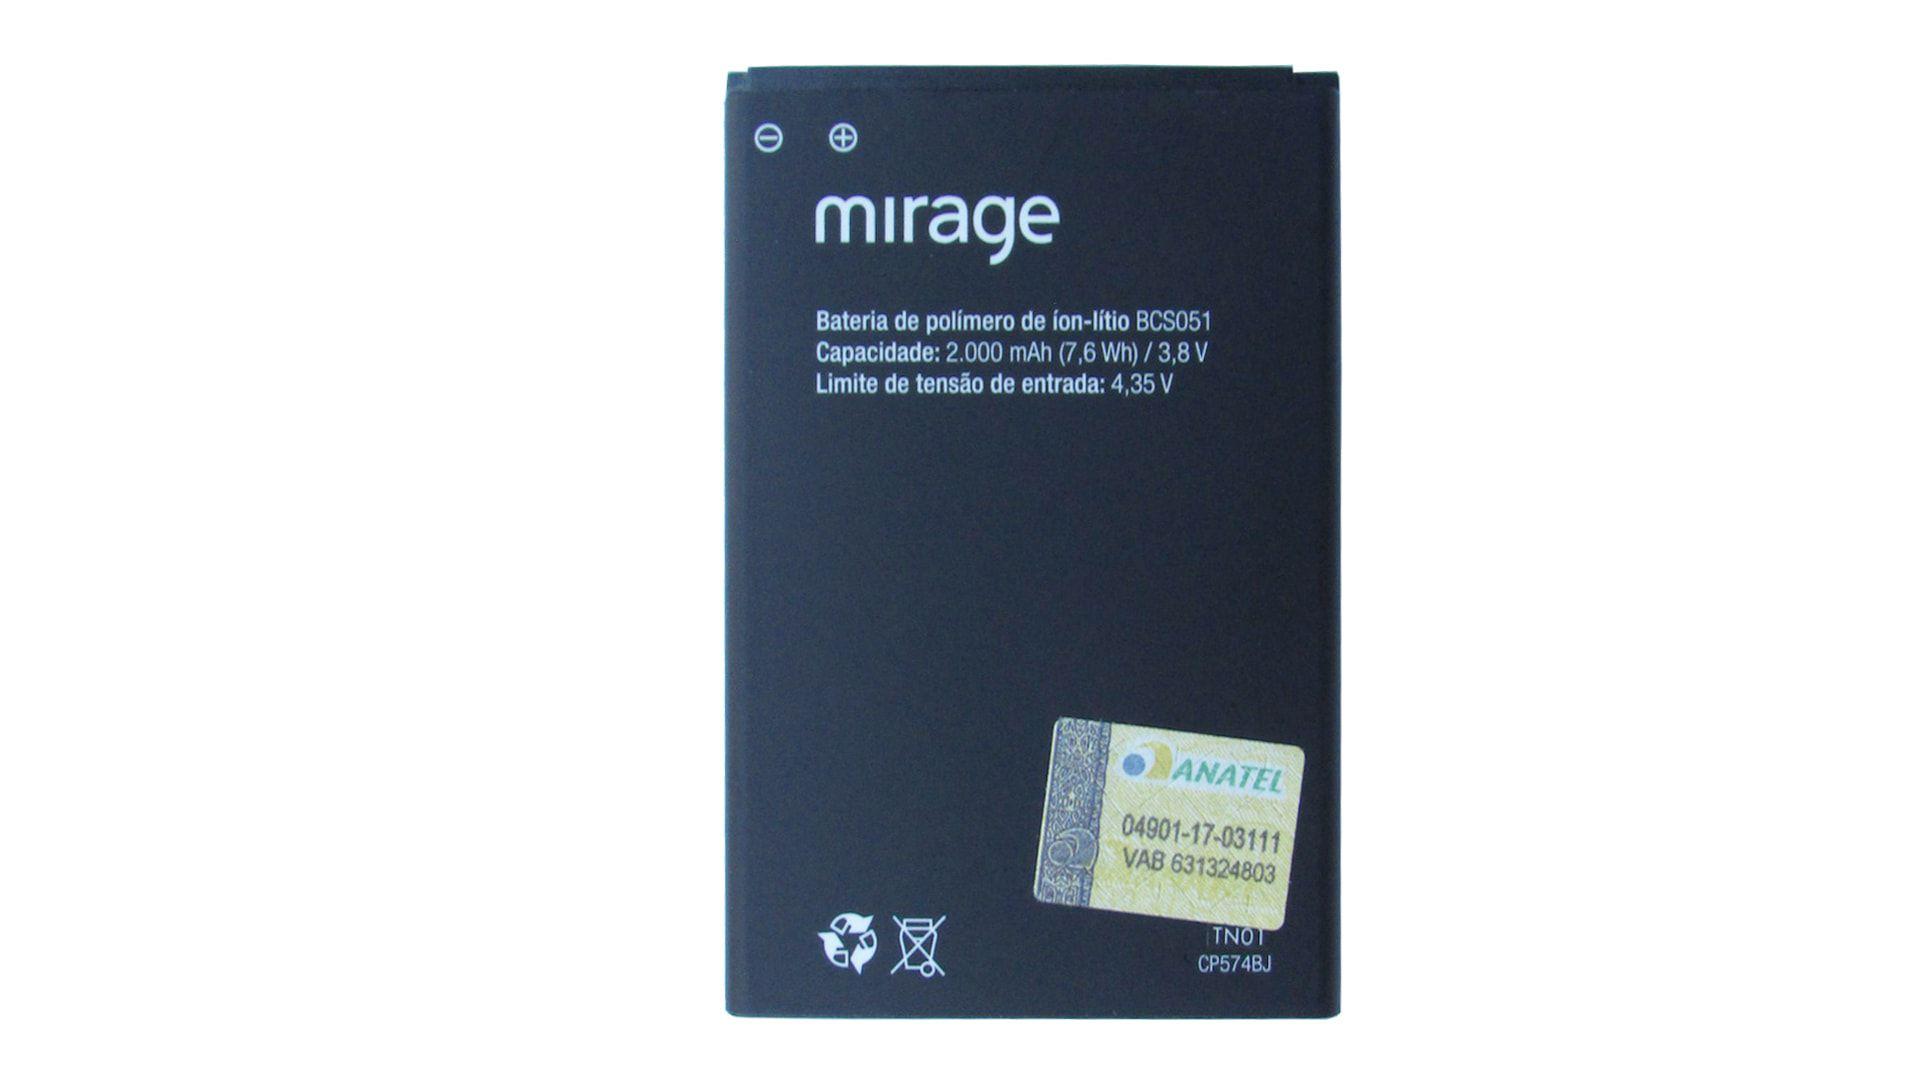 Bateria P/ Celular Mirage 62s 1005/06 Pr211 CP574BJ Bcs051